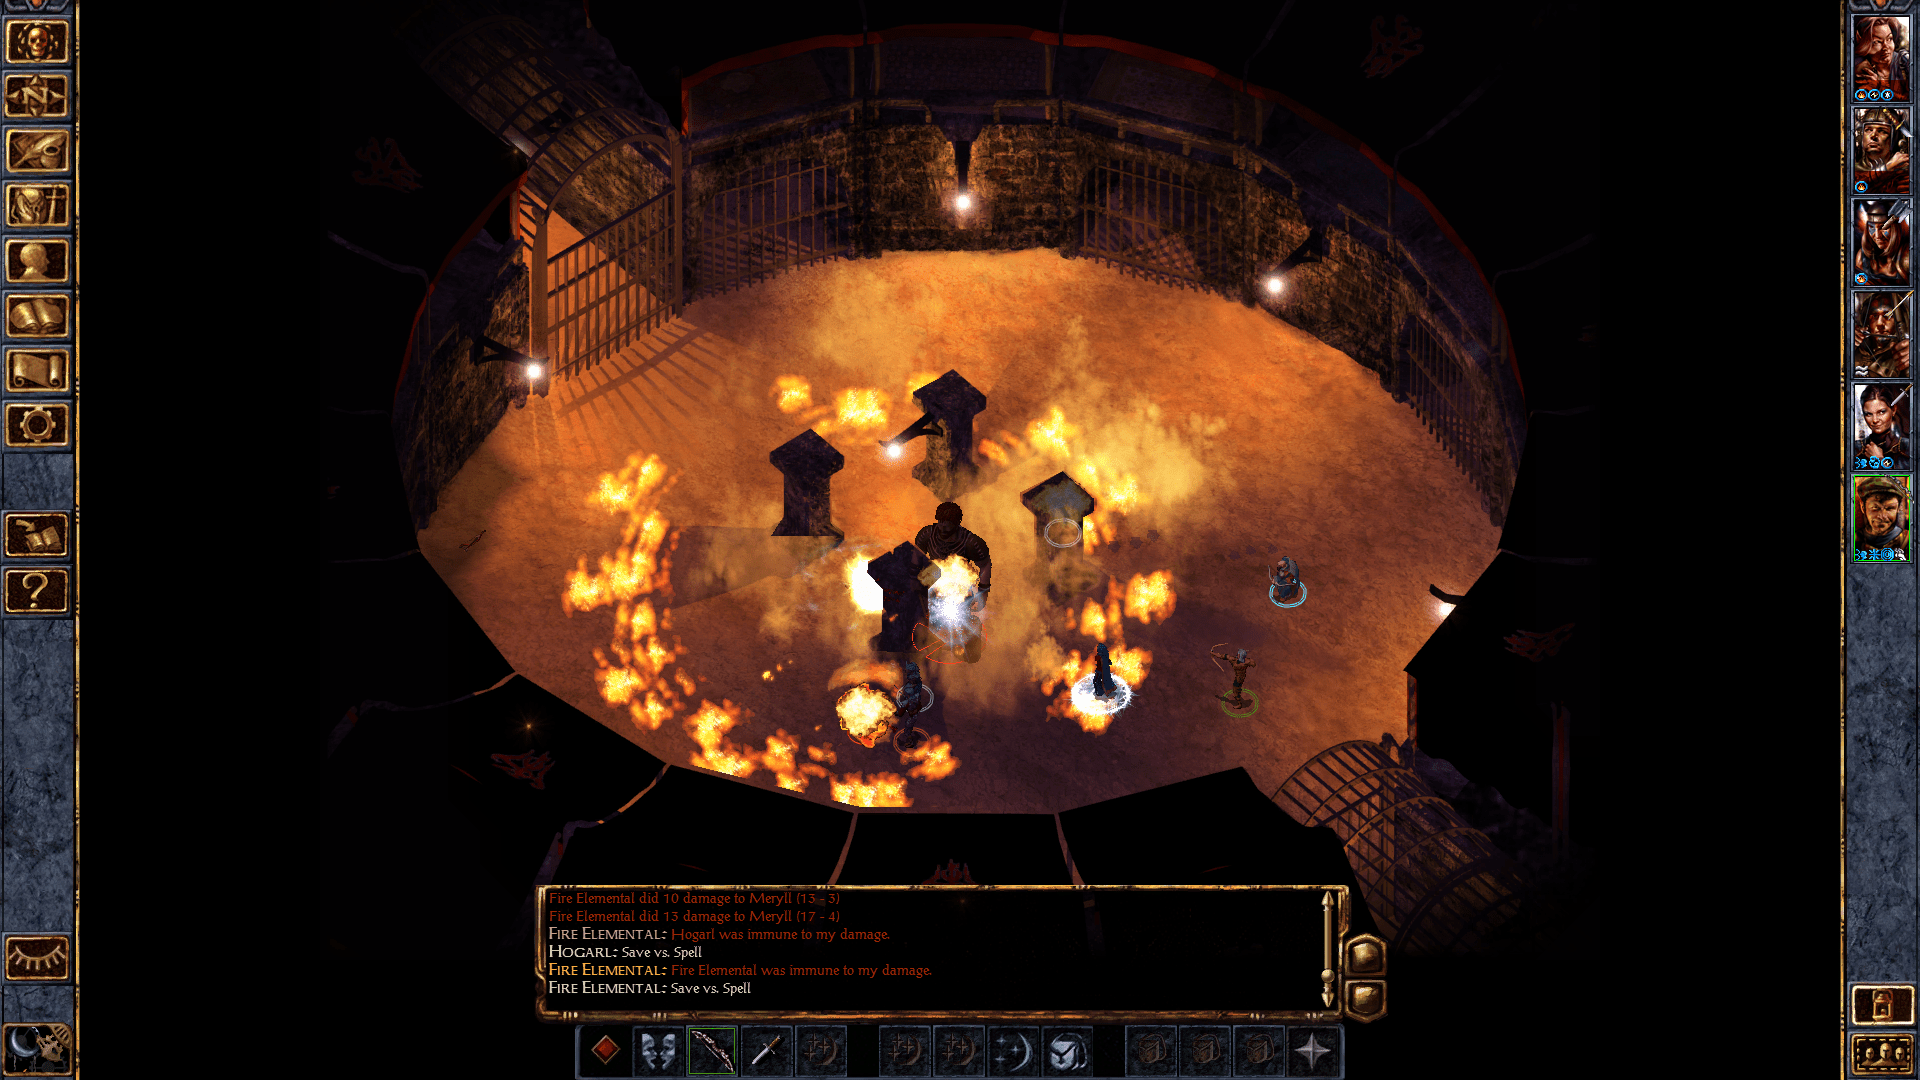 Baldur's Gate: Enhanced Edition on iPad